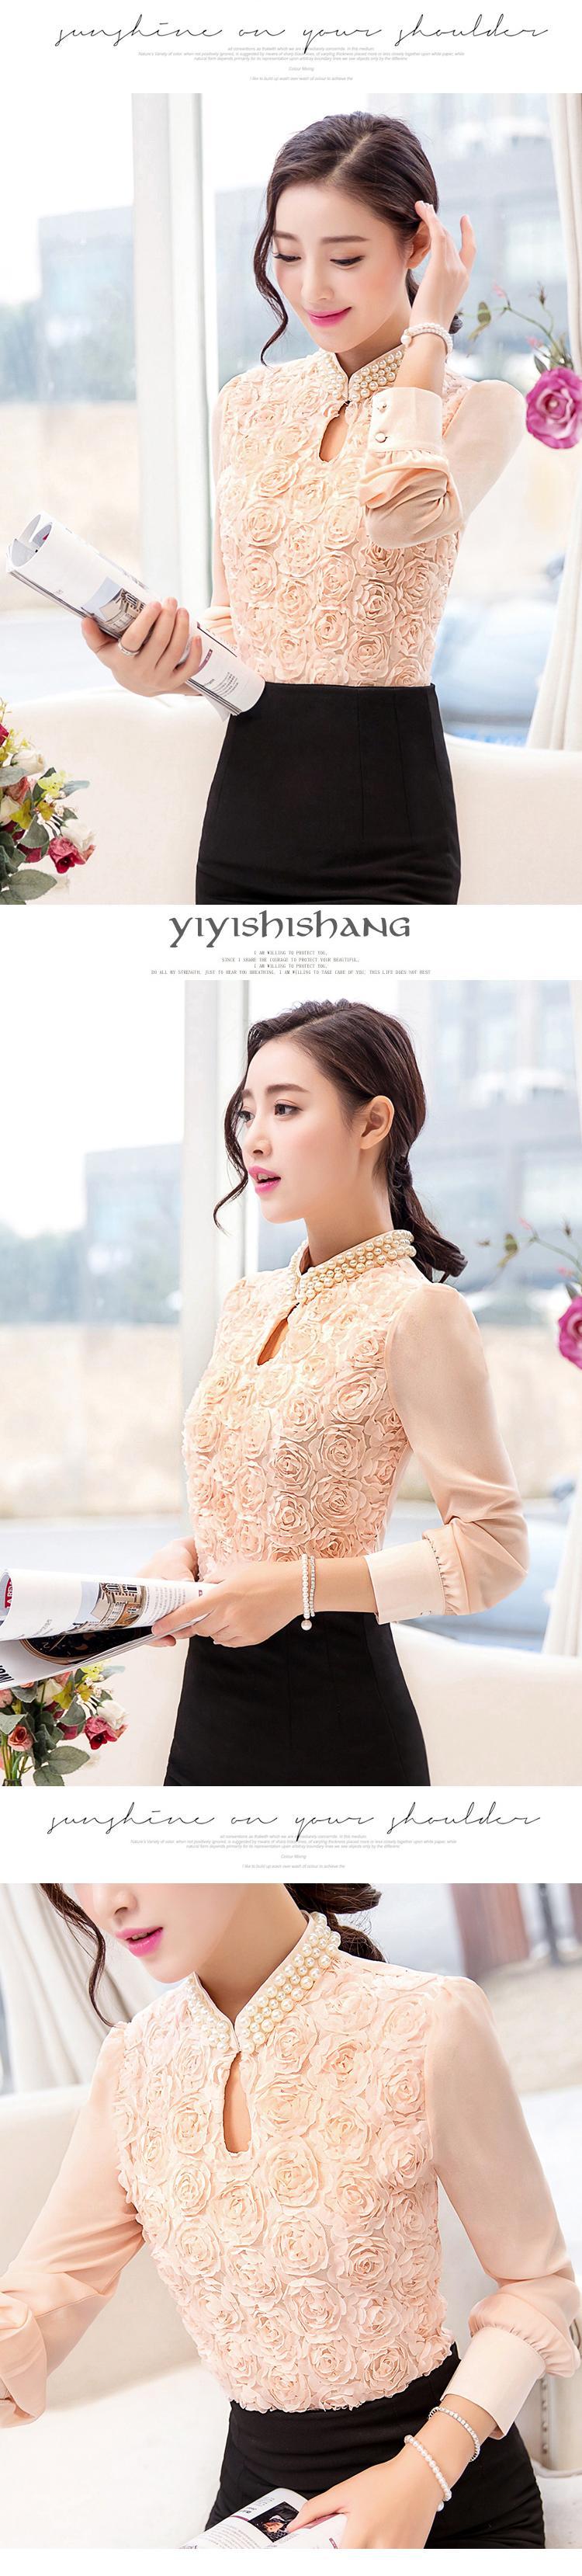 HTB177f7LFXXXXb5XVXXq6xXFXXXE - New Women Chiffon blouse Flower long sleeved Casual shirt